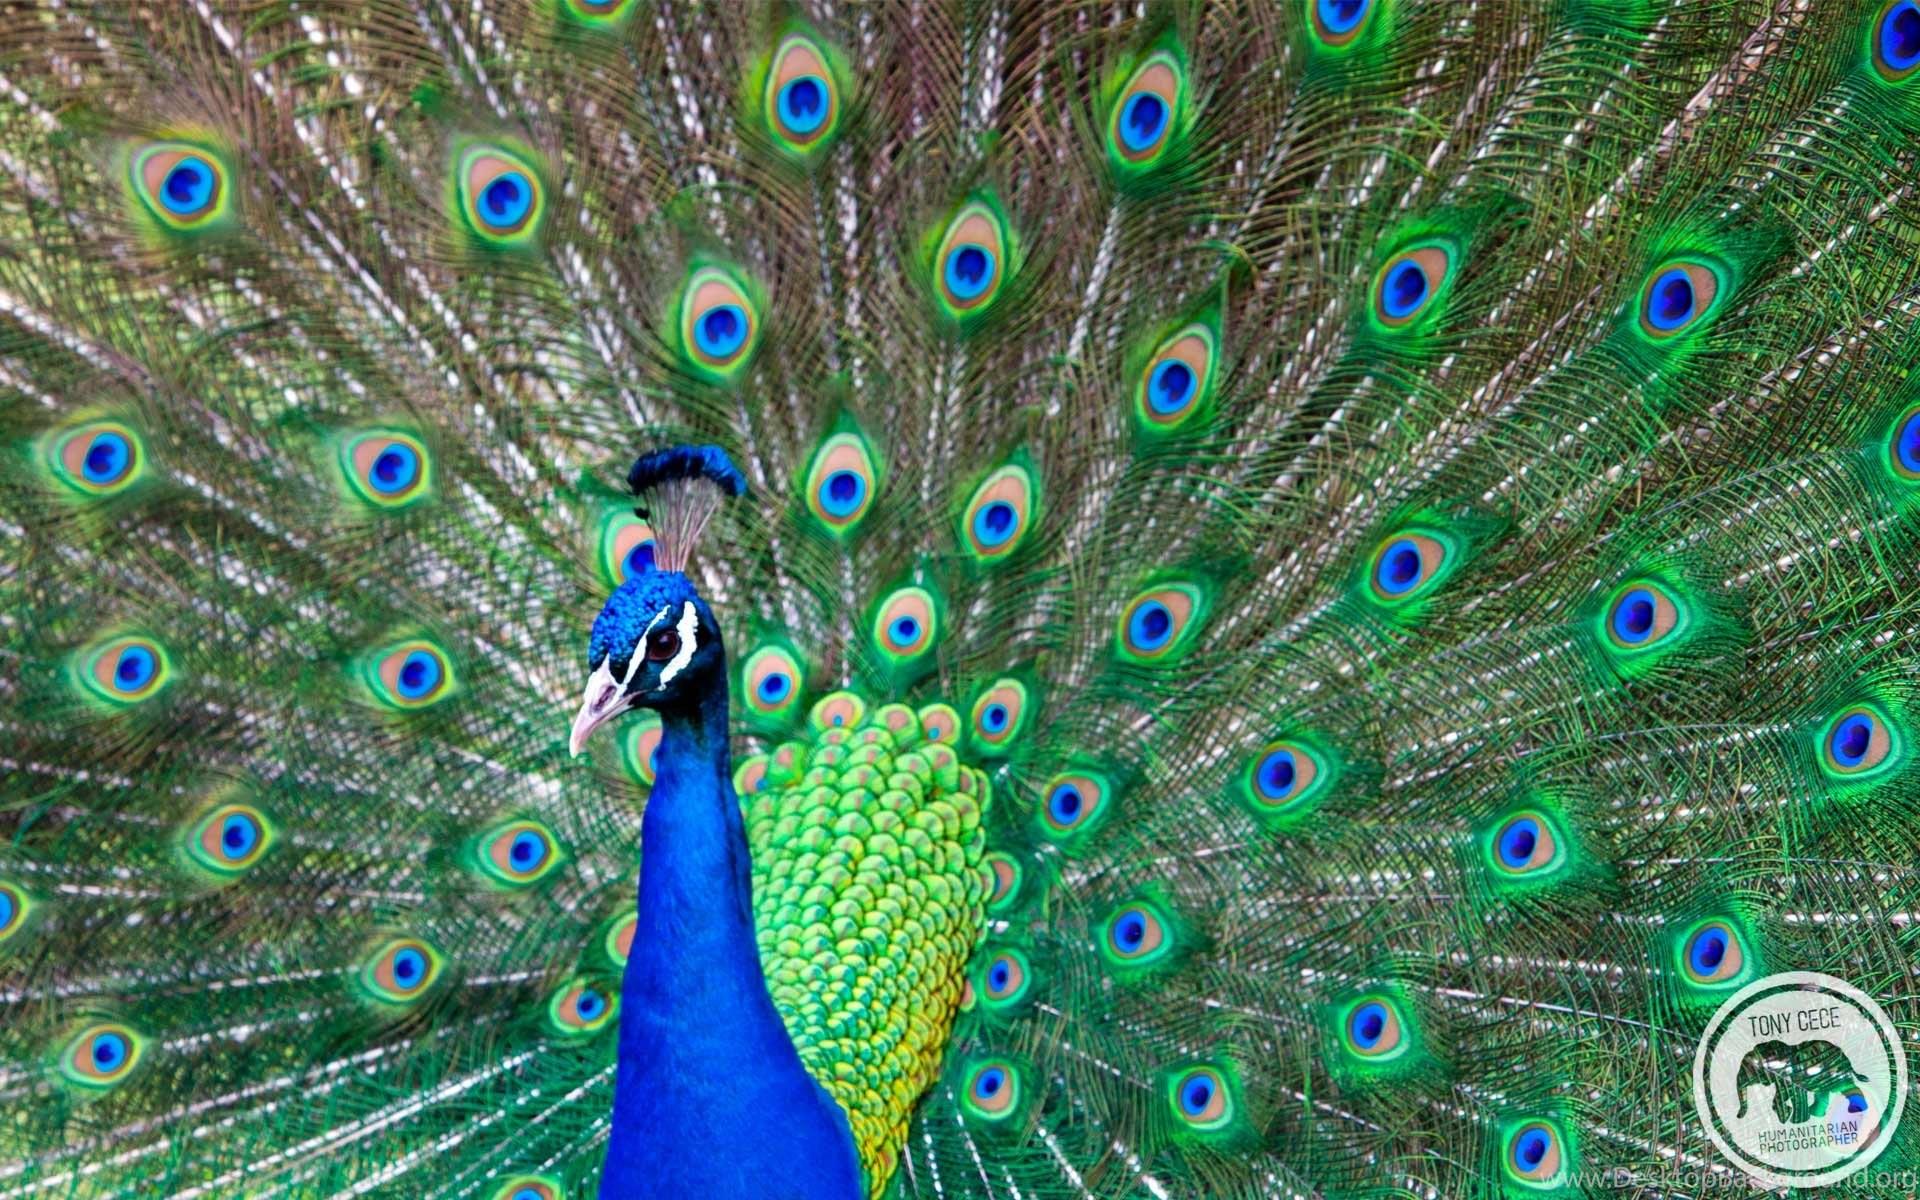 Peacock Wallpaper Beautiful Hd Jpg Desktop Background